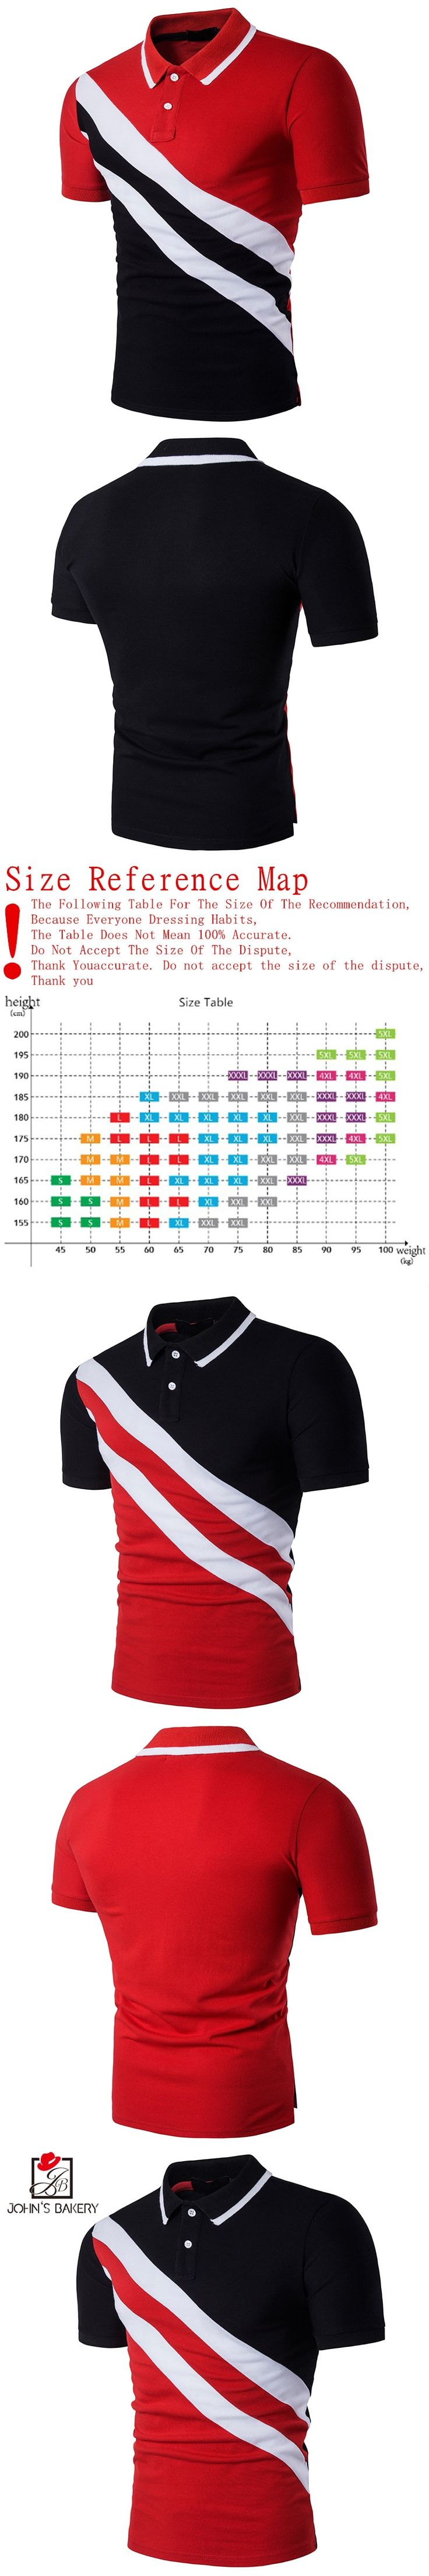 John's Bakery Polo Shirt Men 2017 Brand Clothing Oblique Stripes Polo Shirt Cotton Short Sleeve Poloshirt Men S-XXL B67CYXZ